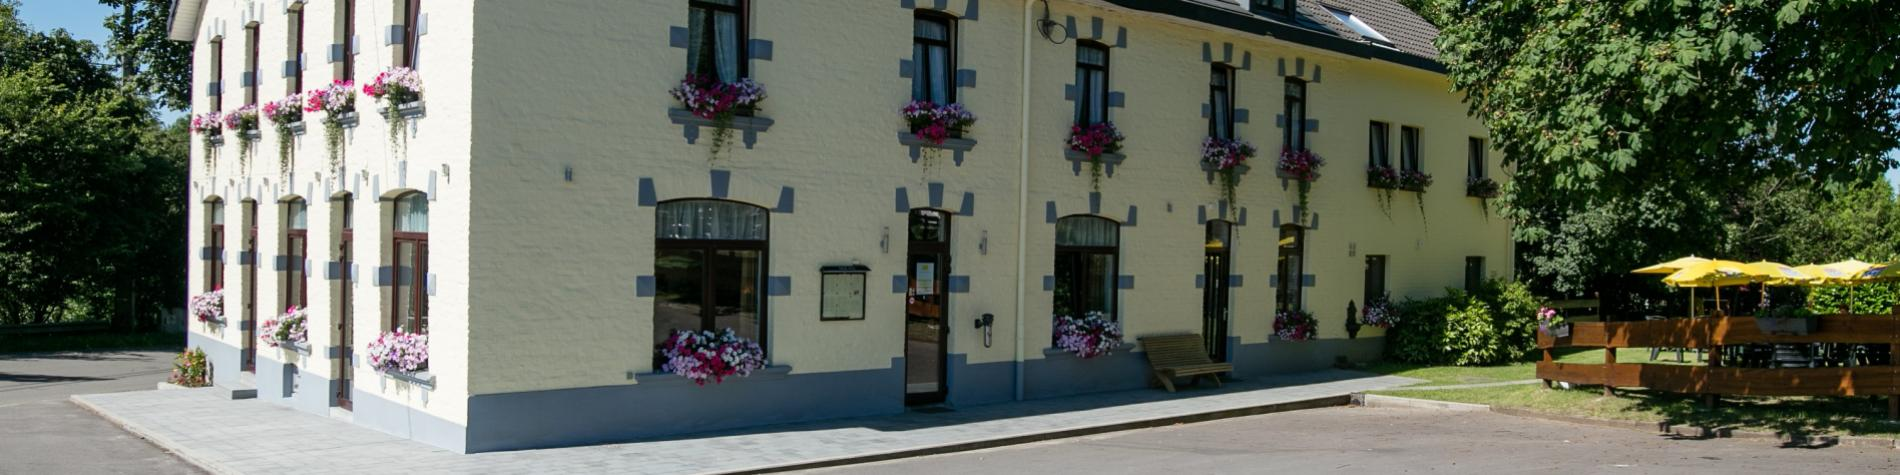 Hôtel-restaurant-Stavelot